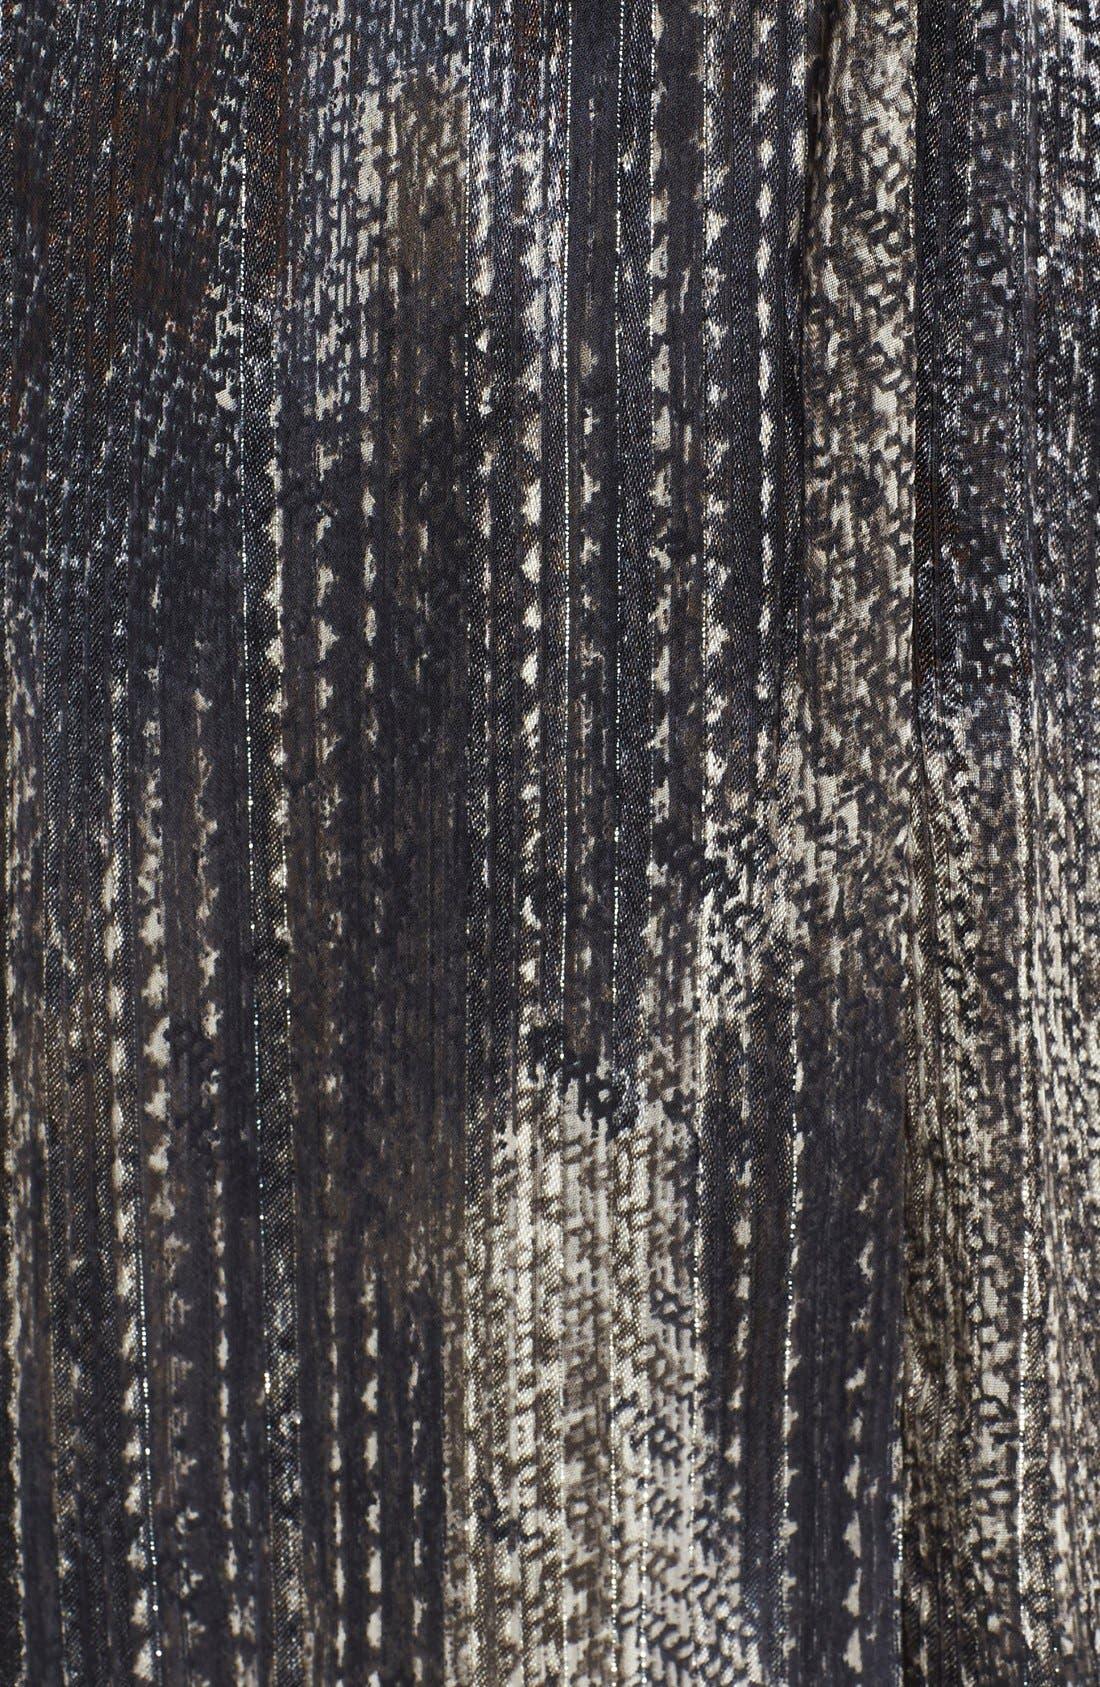 Crossover Maternity Dress,                             Alternate thumbnail 4, color,                             Metallic Lurex Print